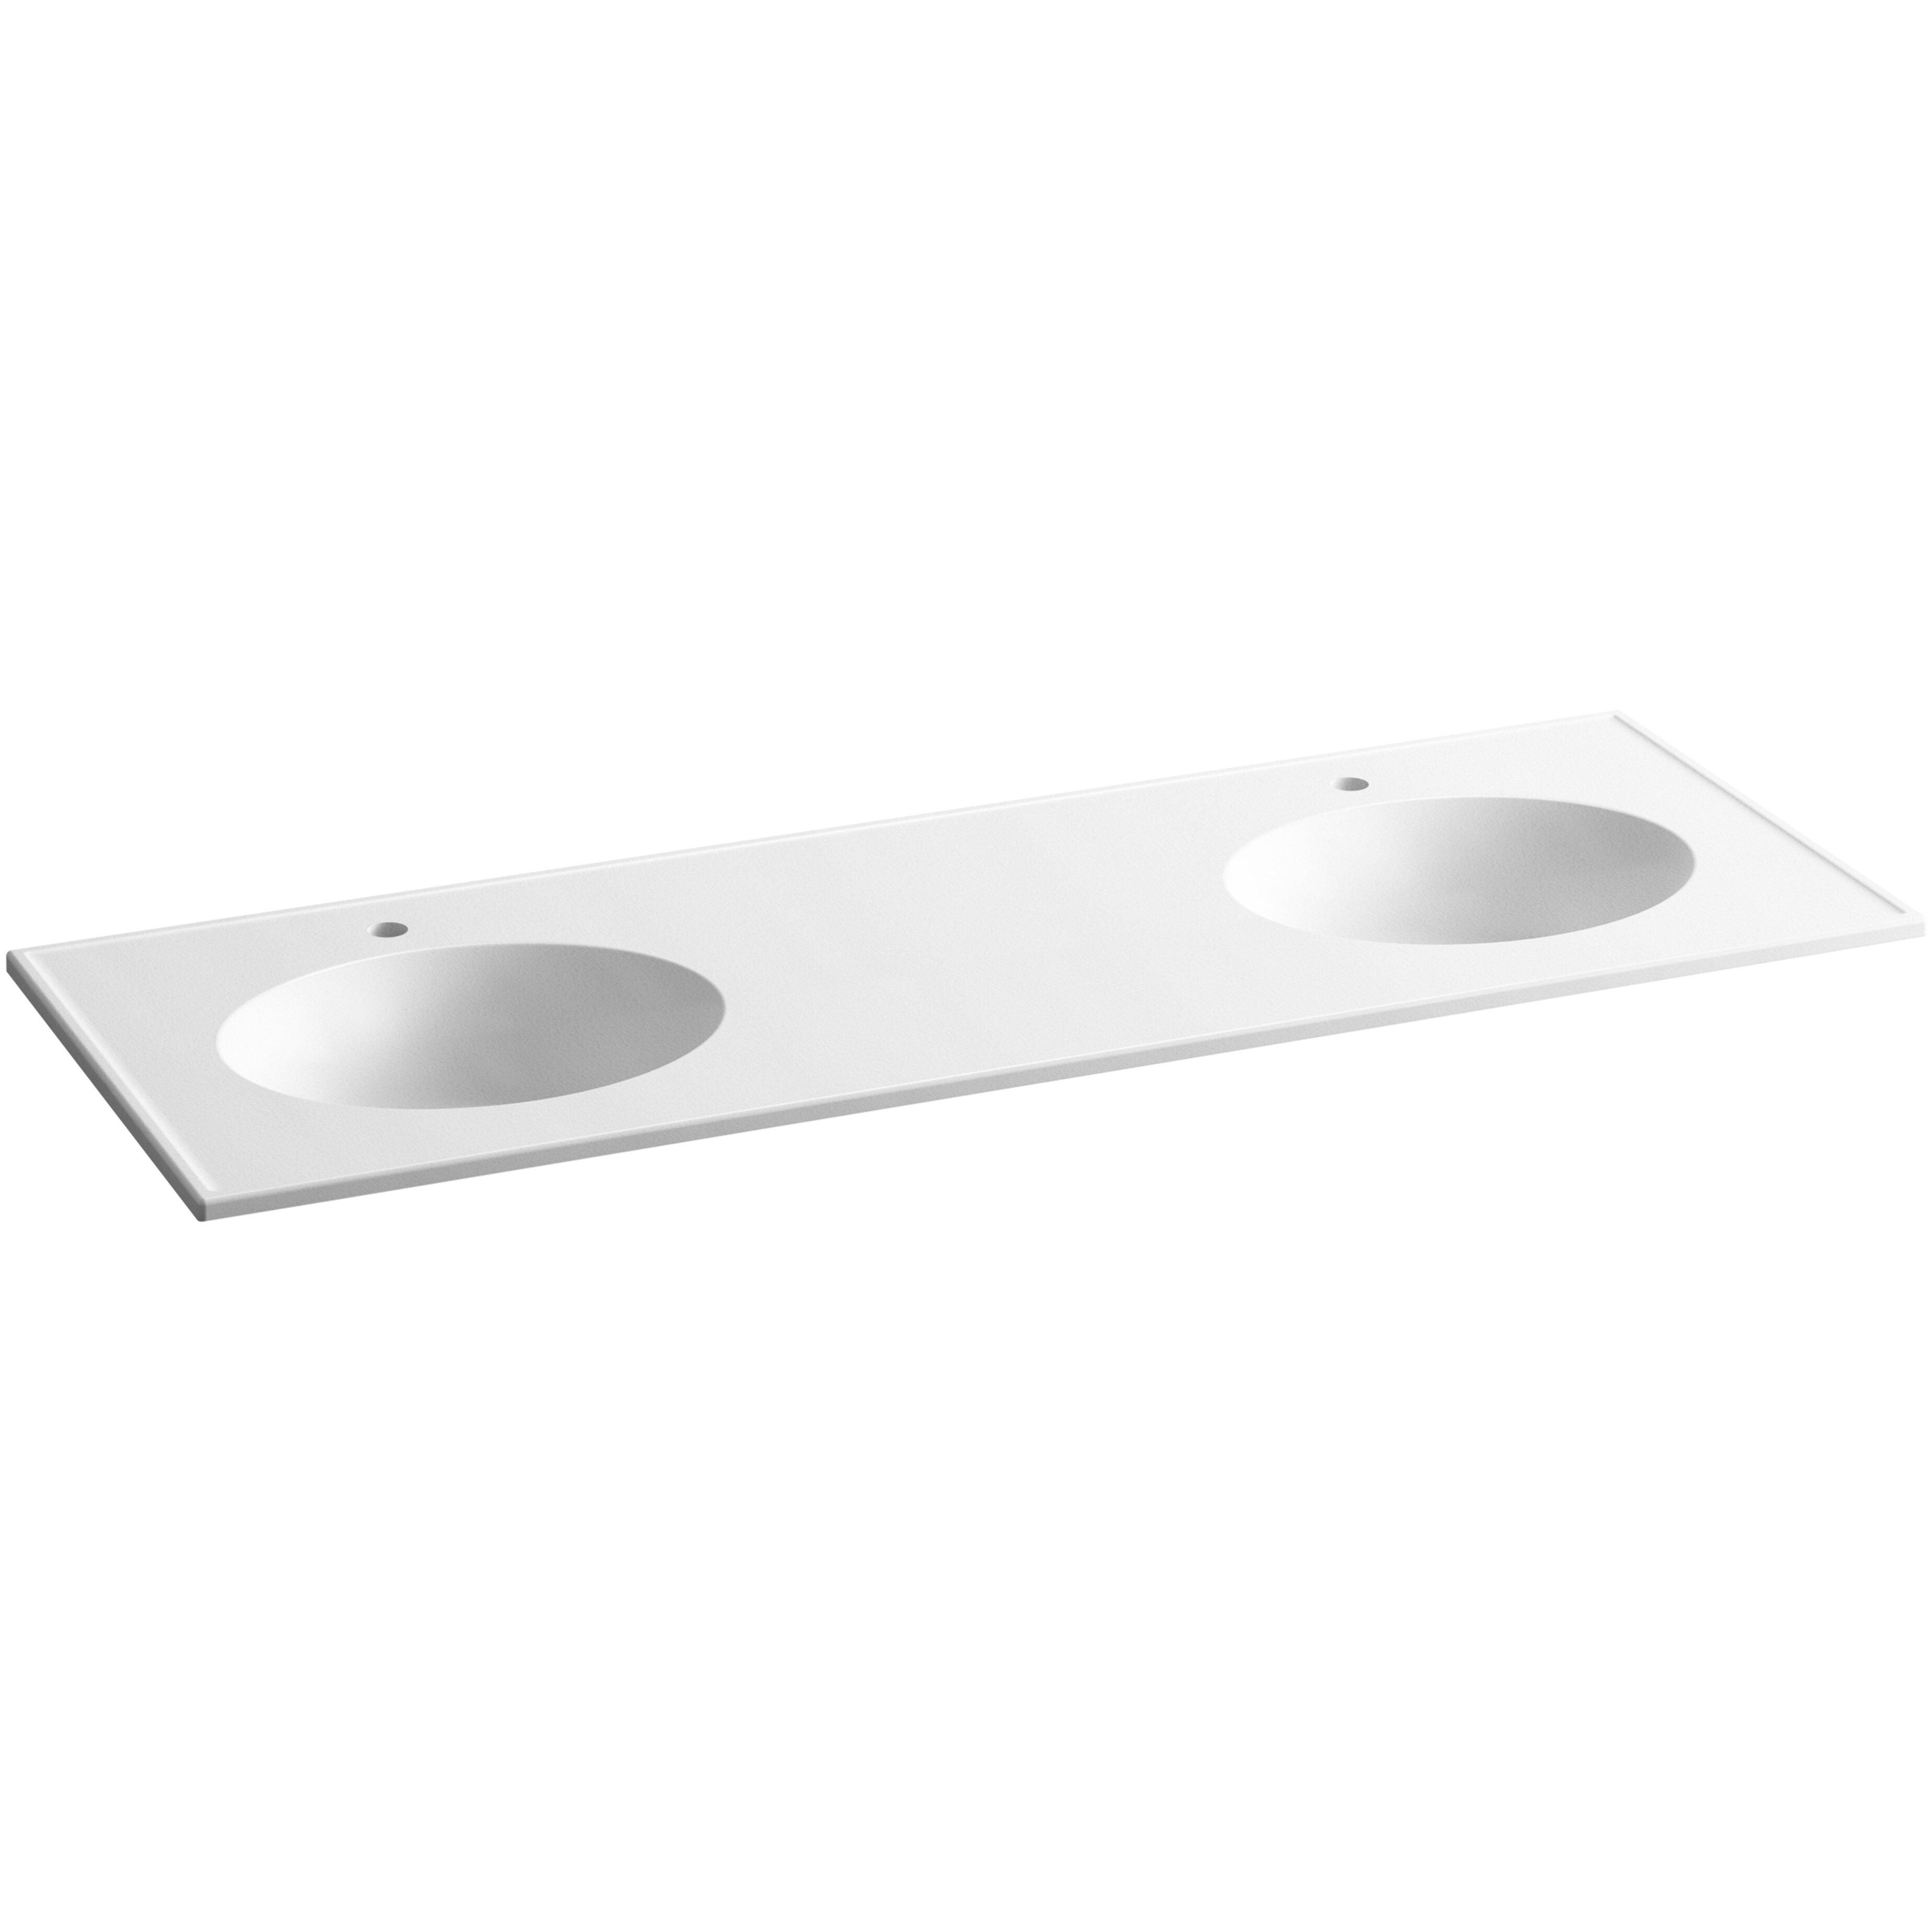 "Double Bowl Vanity Tops For Bathrooms: Ceramic/Impressions 61"" Oval Double-Bowl Vanity-Top"